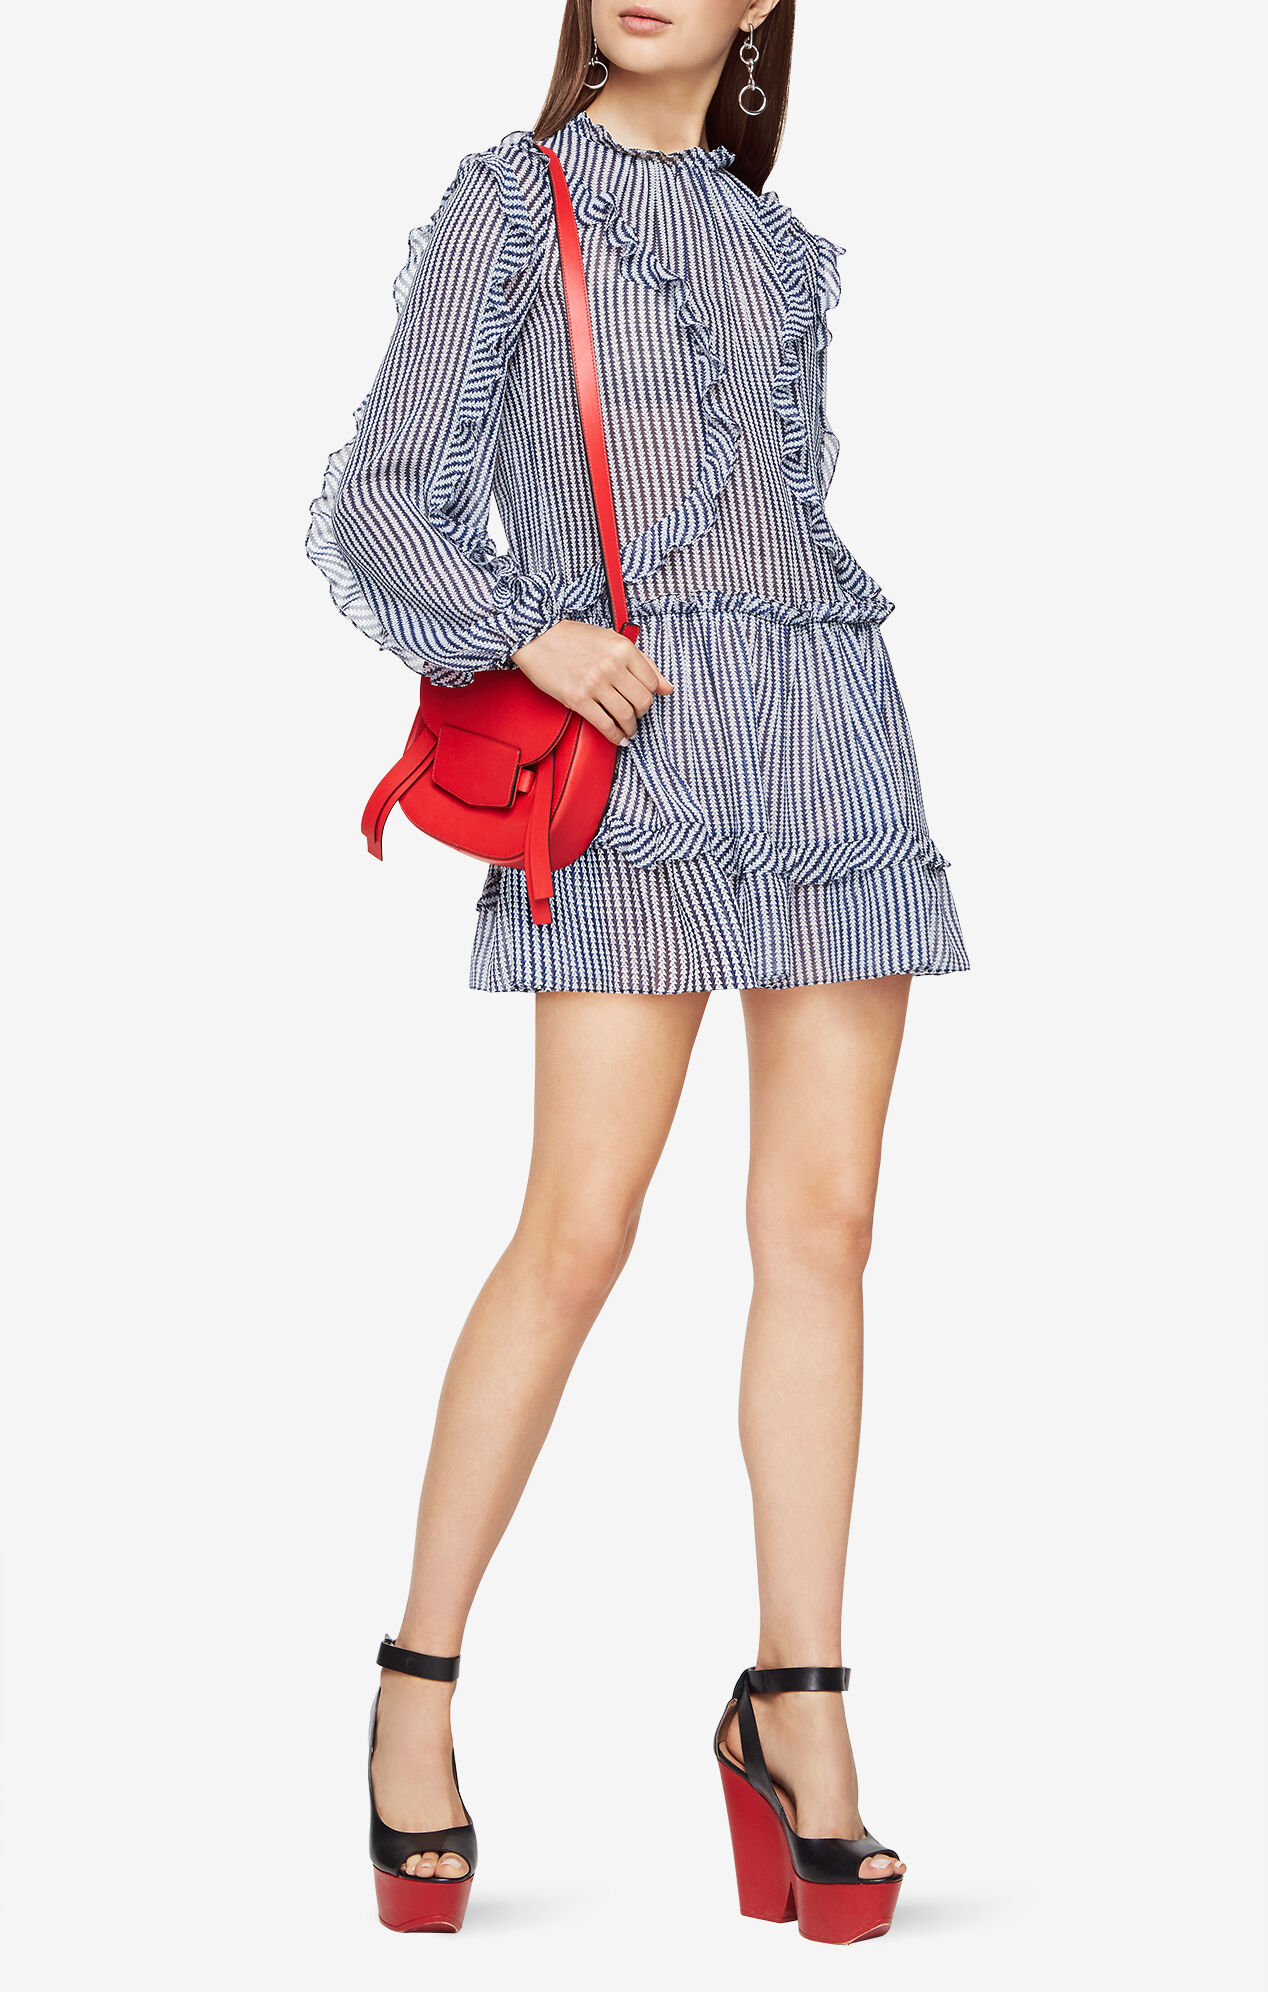 Rosemarie Ruffled Striped Dress